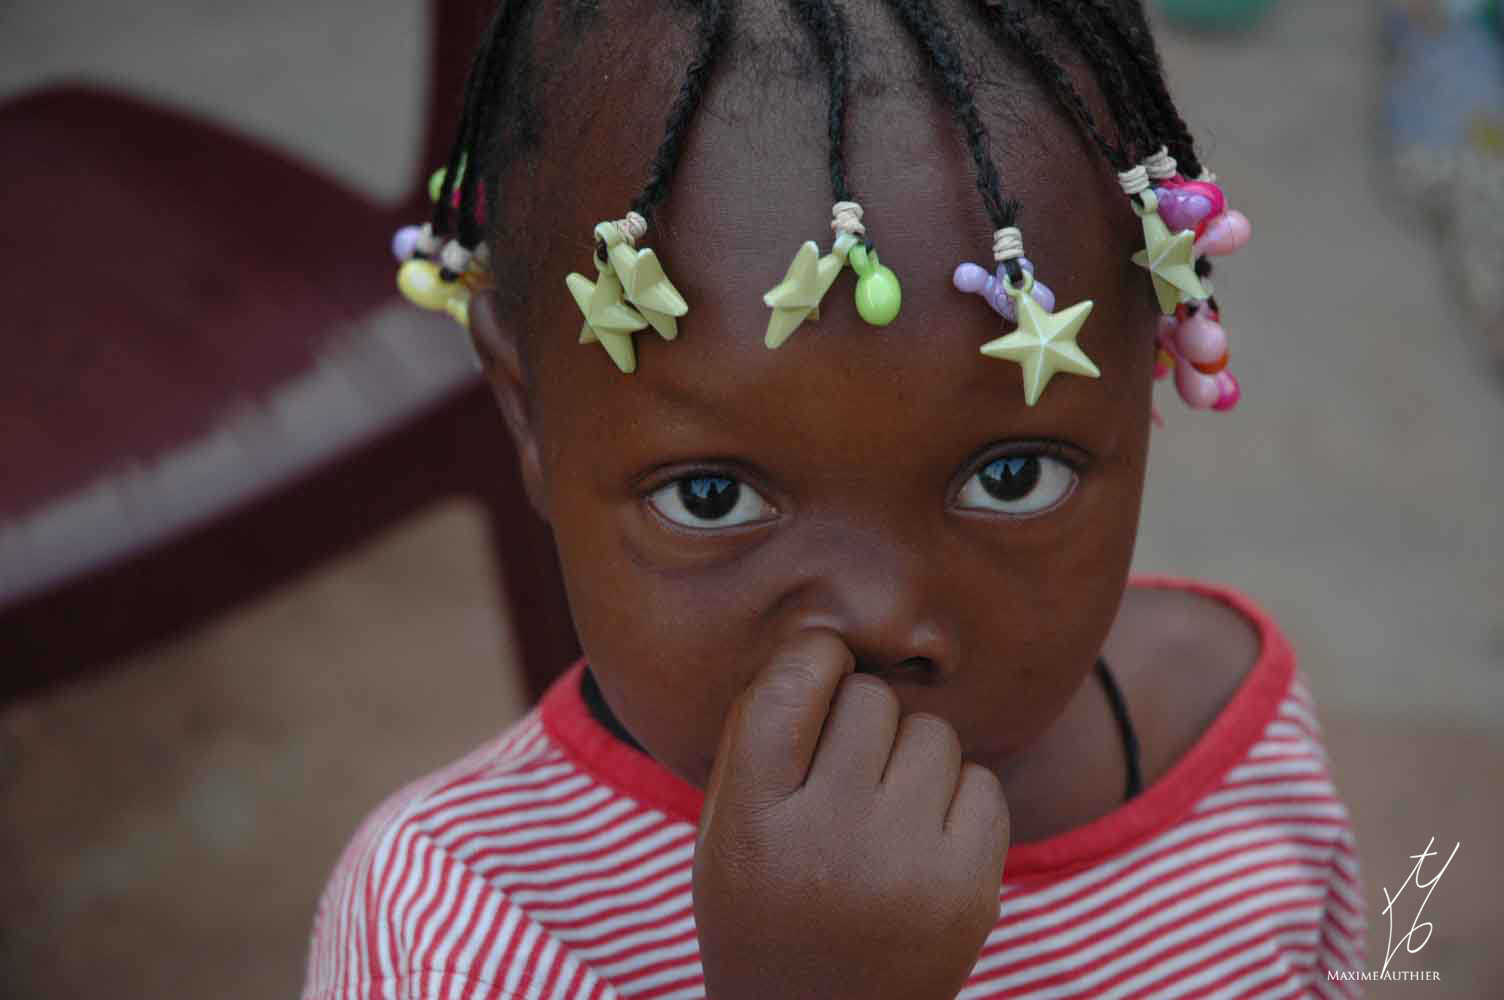 Jolie coiffure et jolie regard d'une petite fille africaine